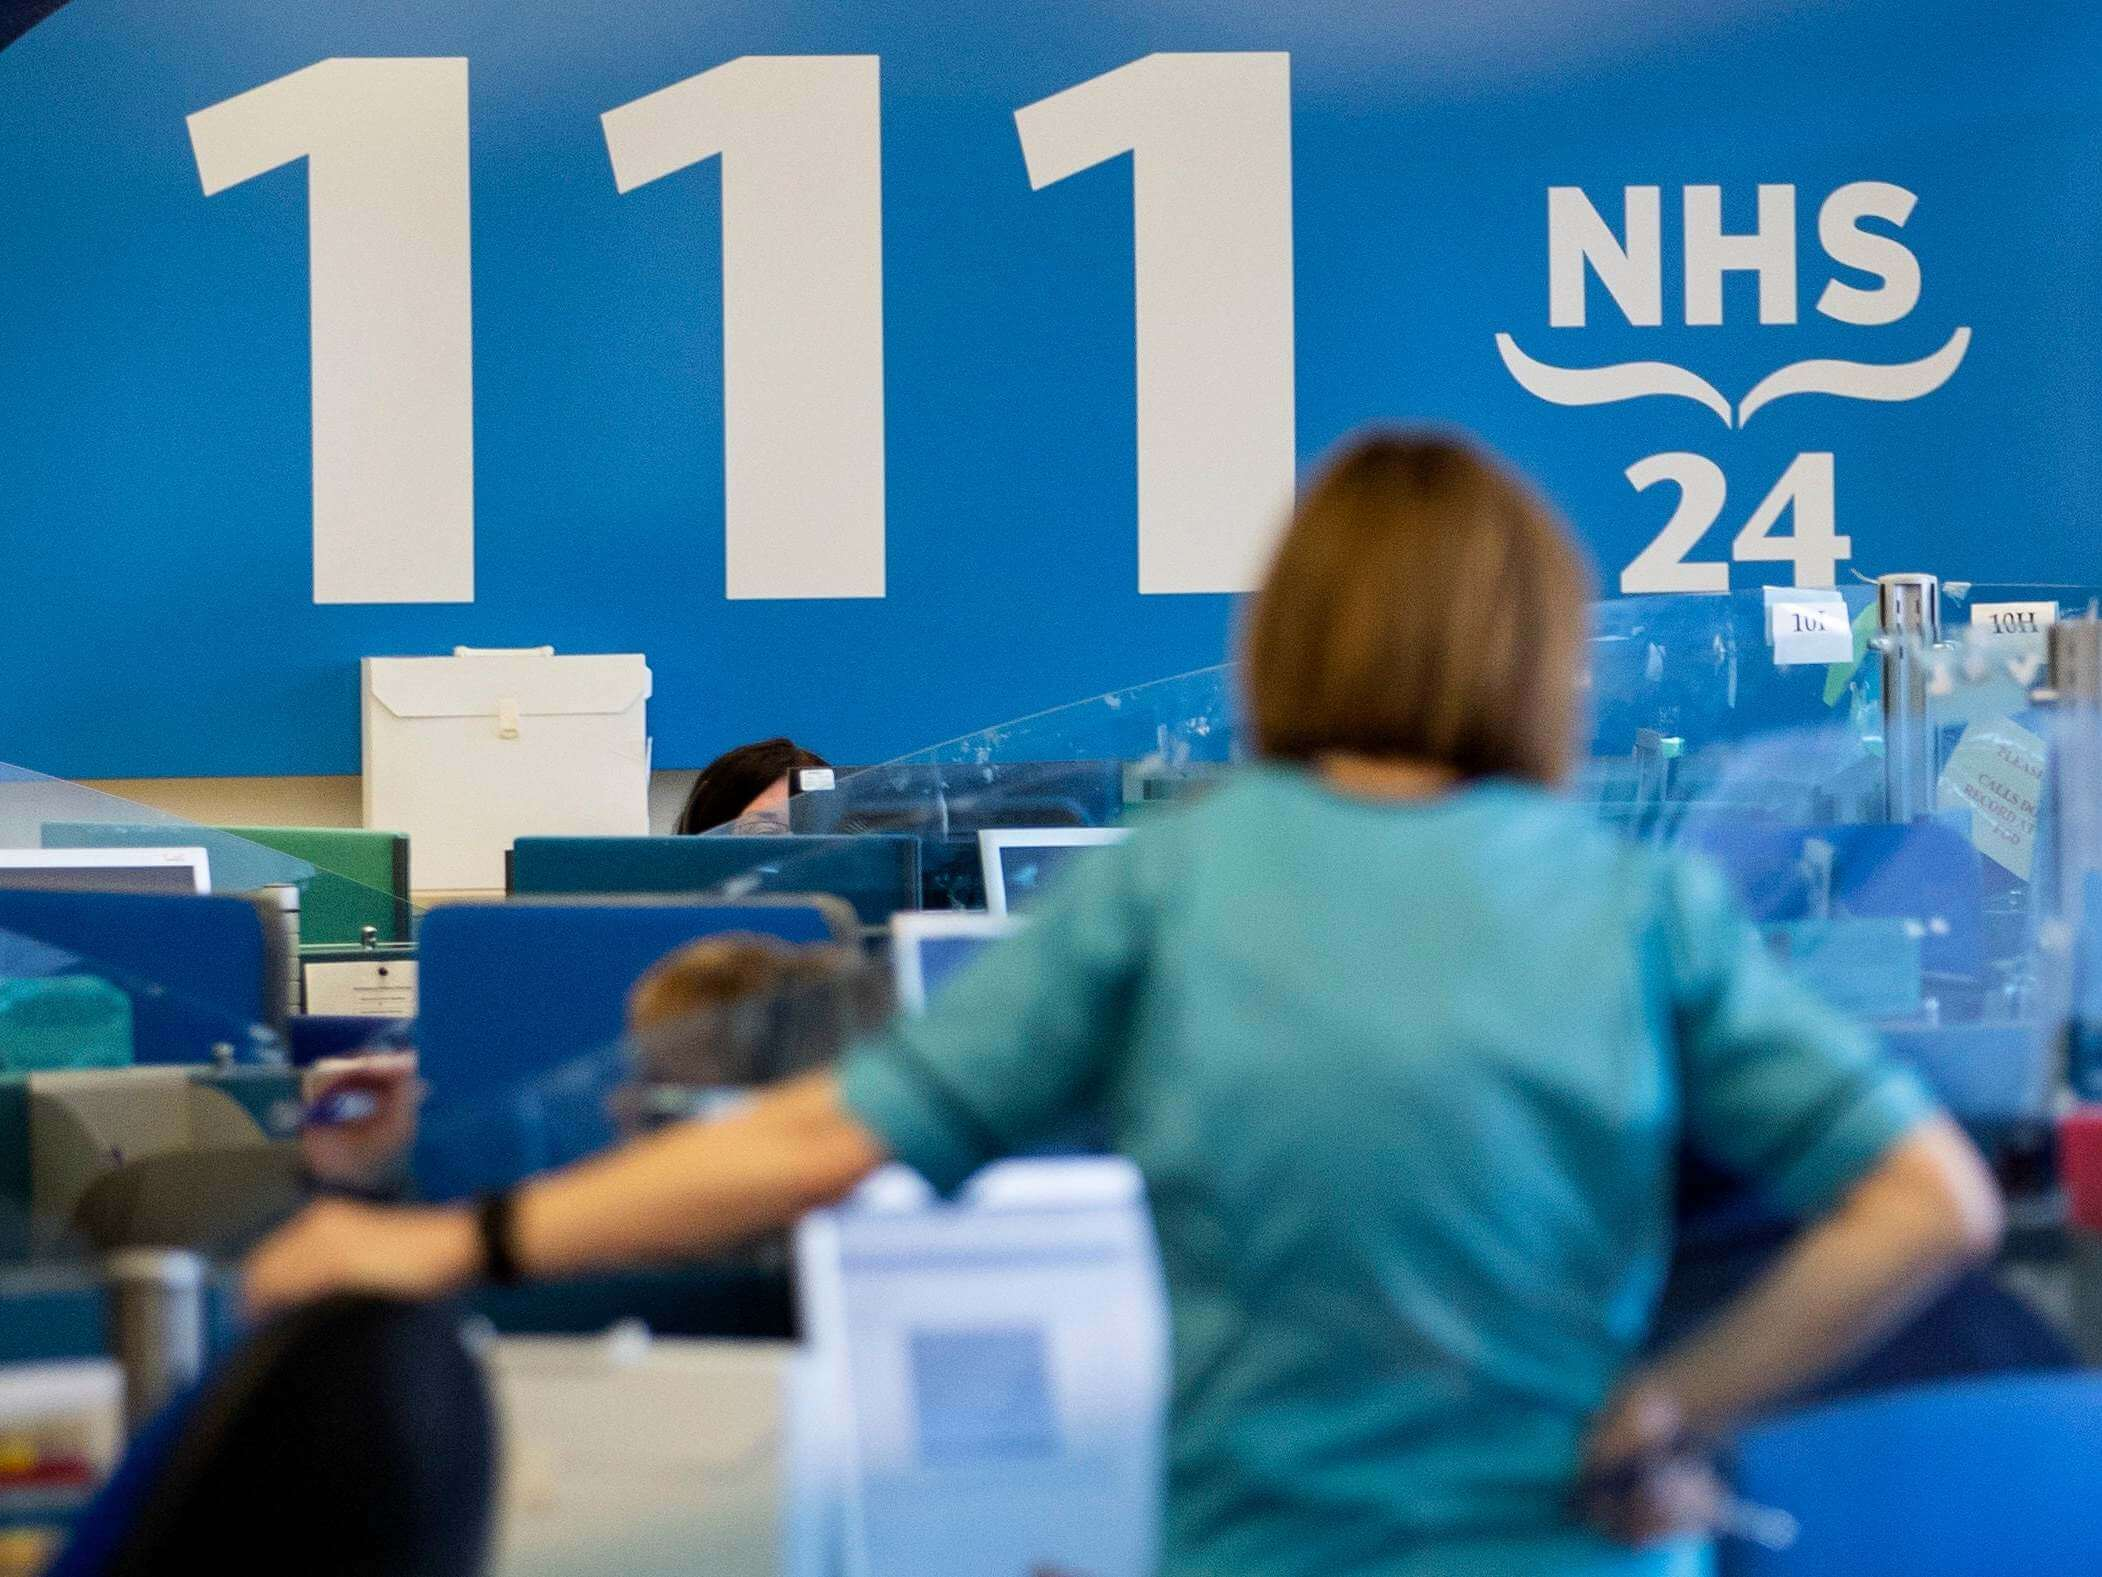 statutory-sick-pay-nhs-uk